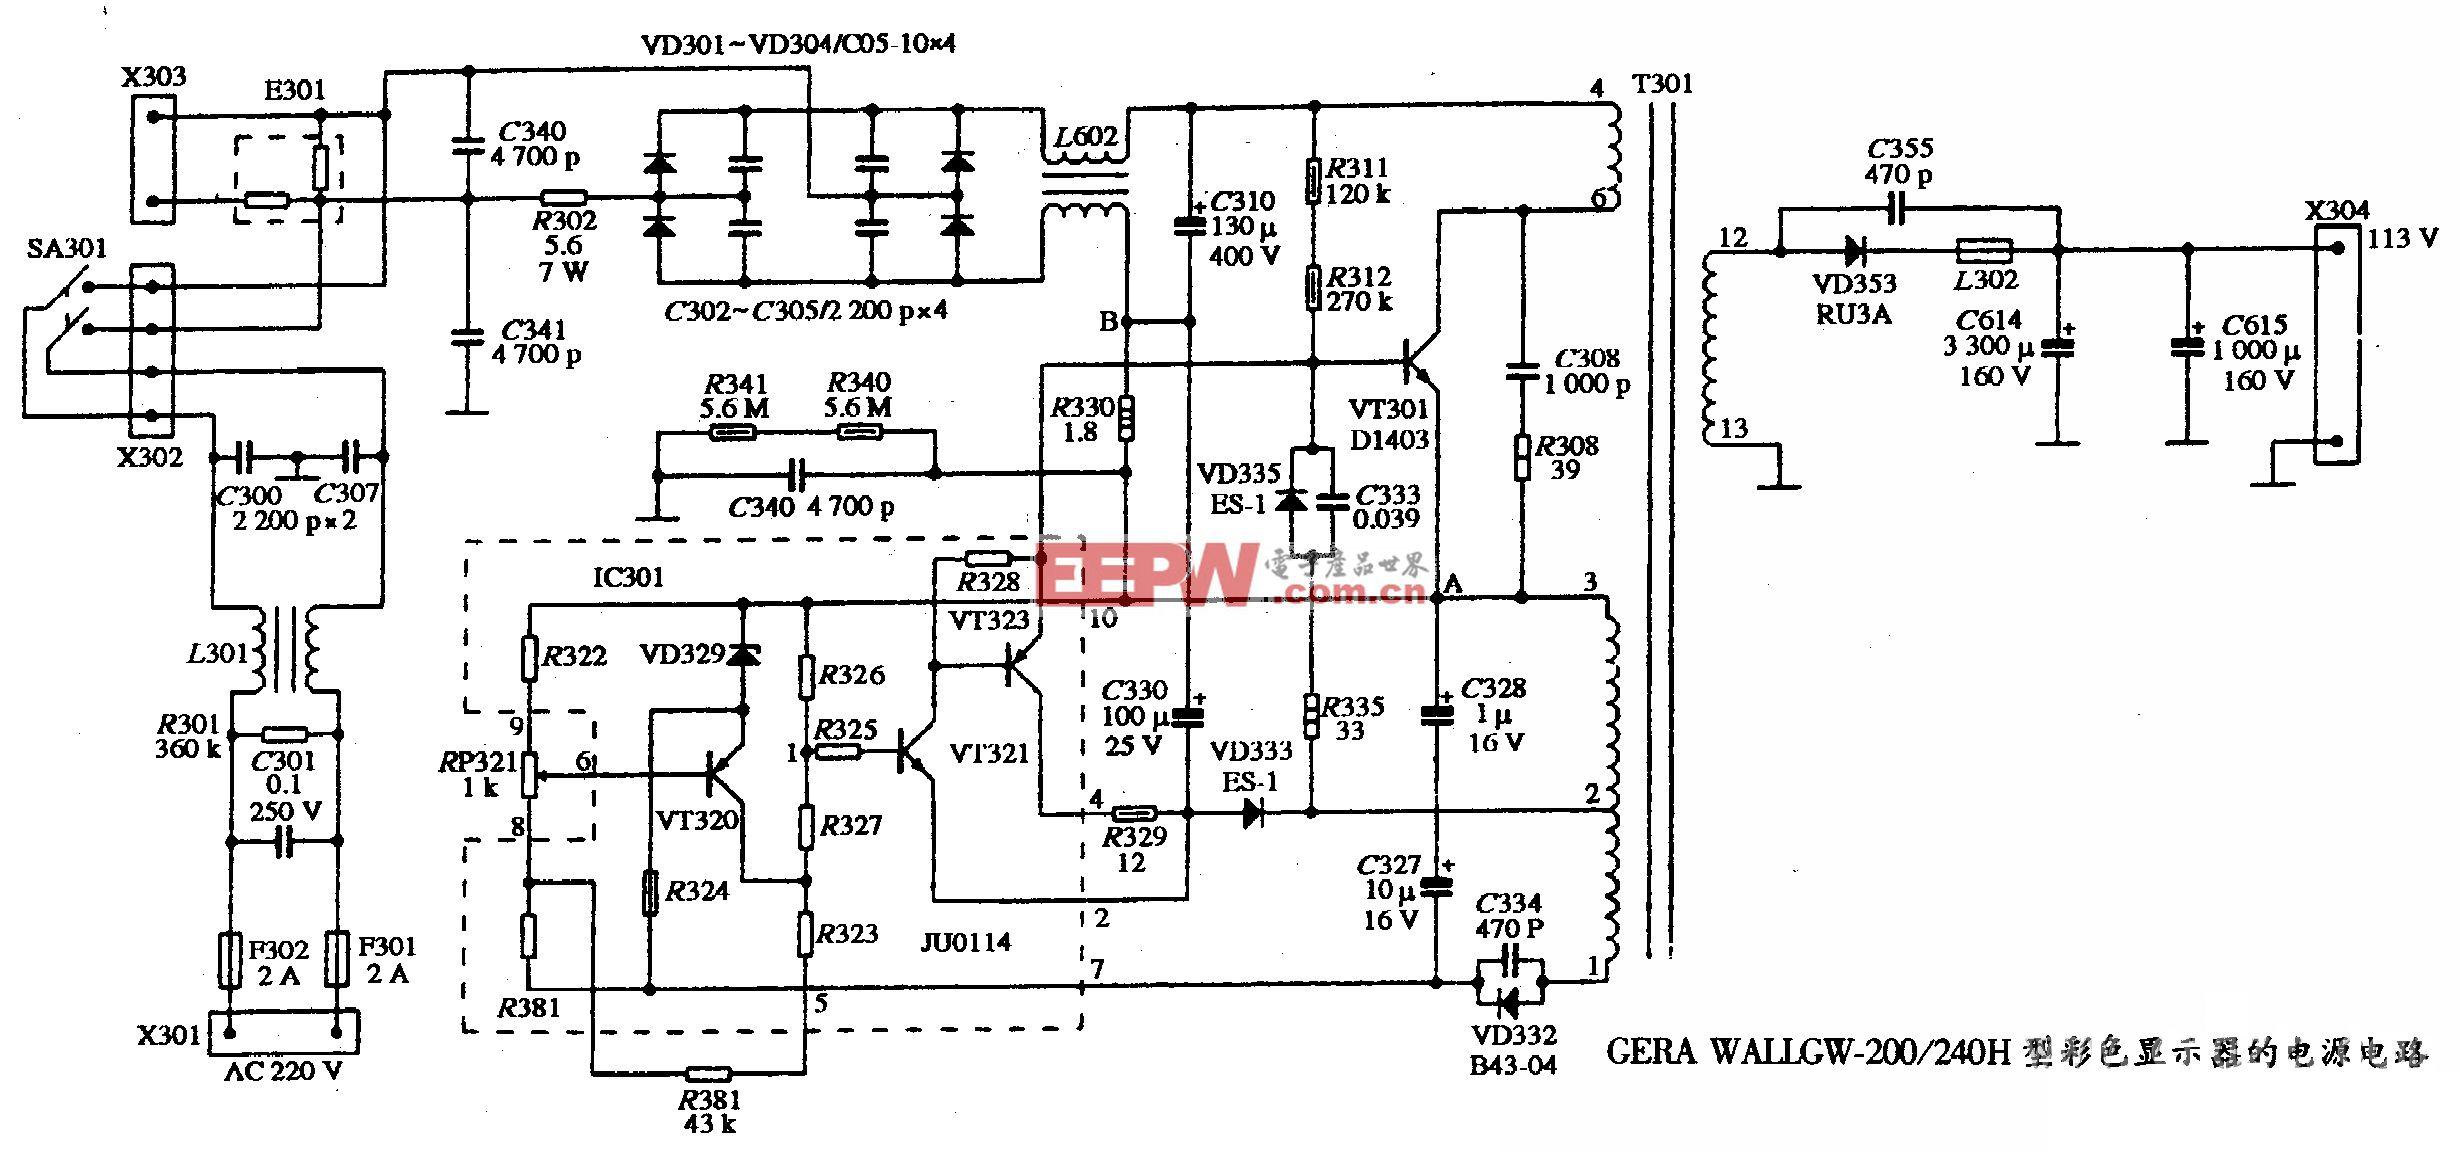 GERAT WALL GW-200/200H型彩色显示器的电源电路图